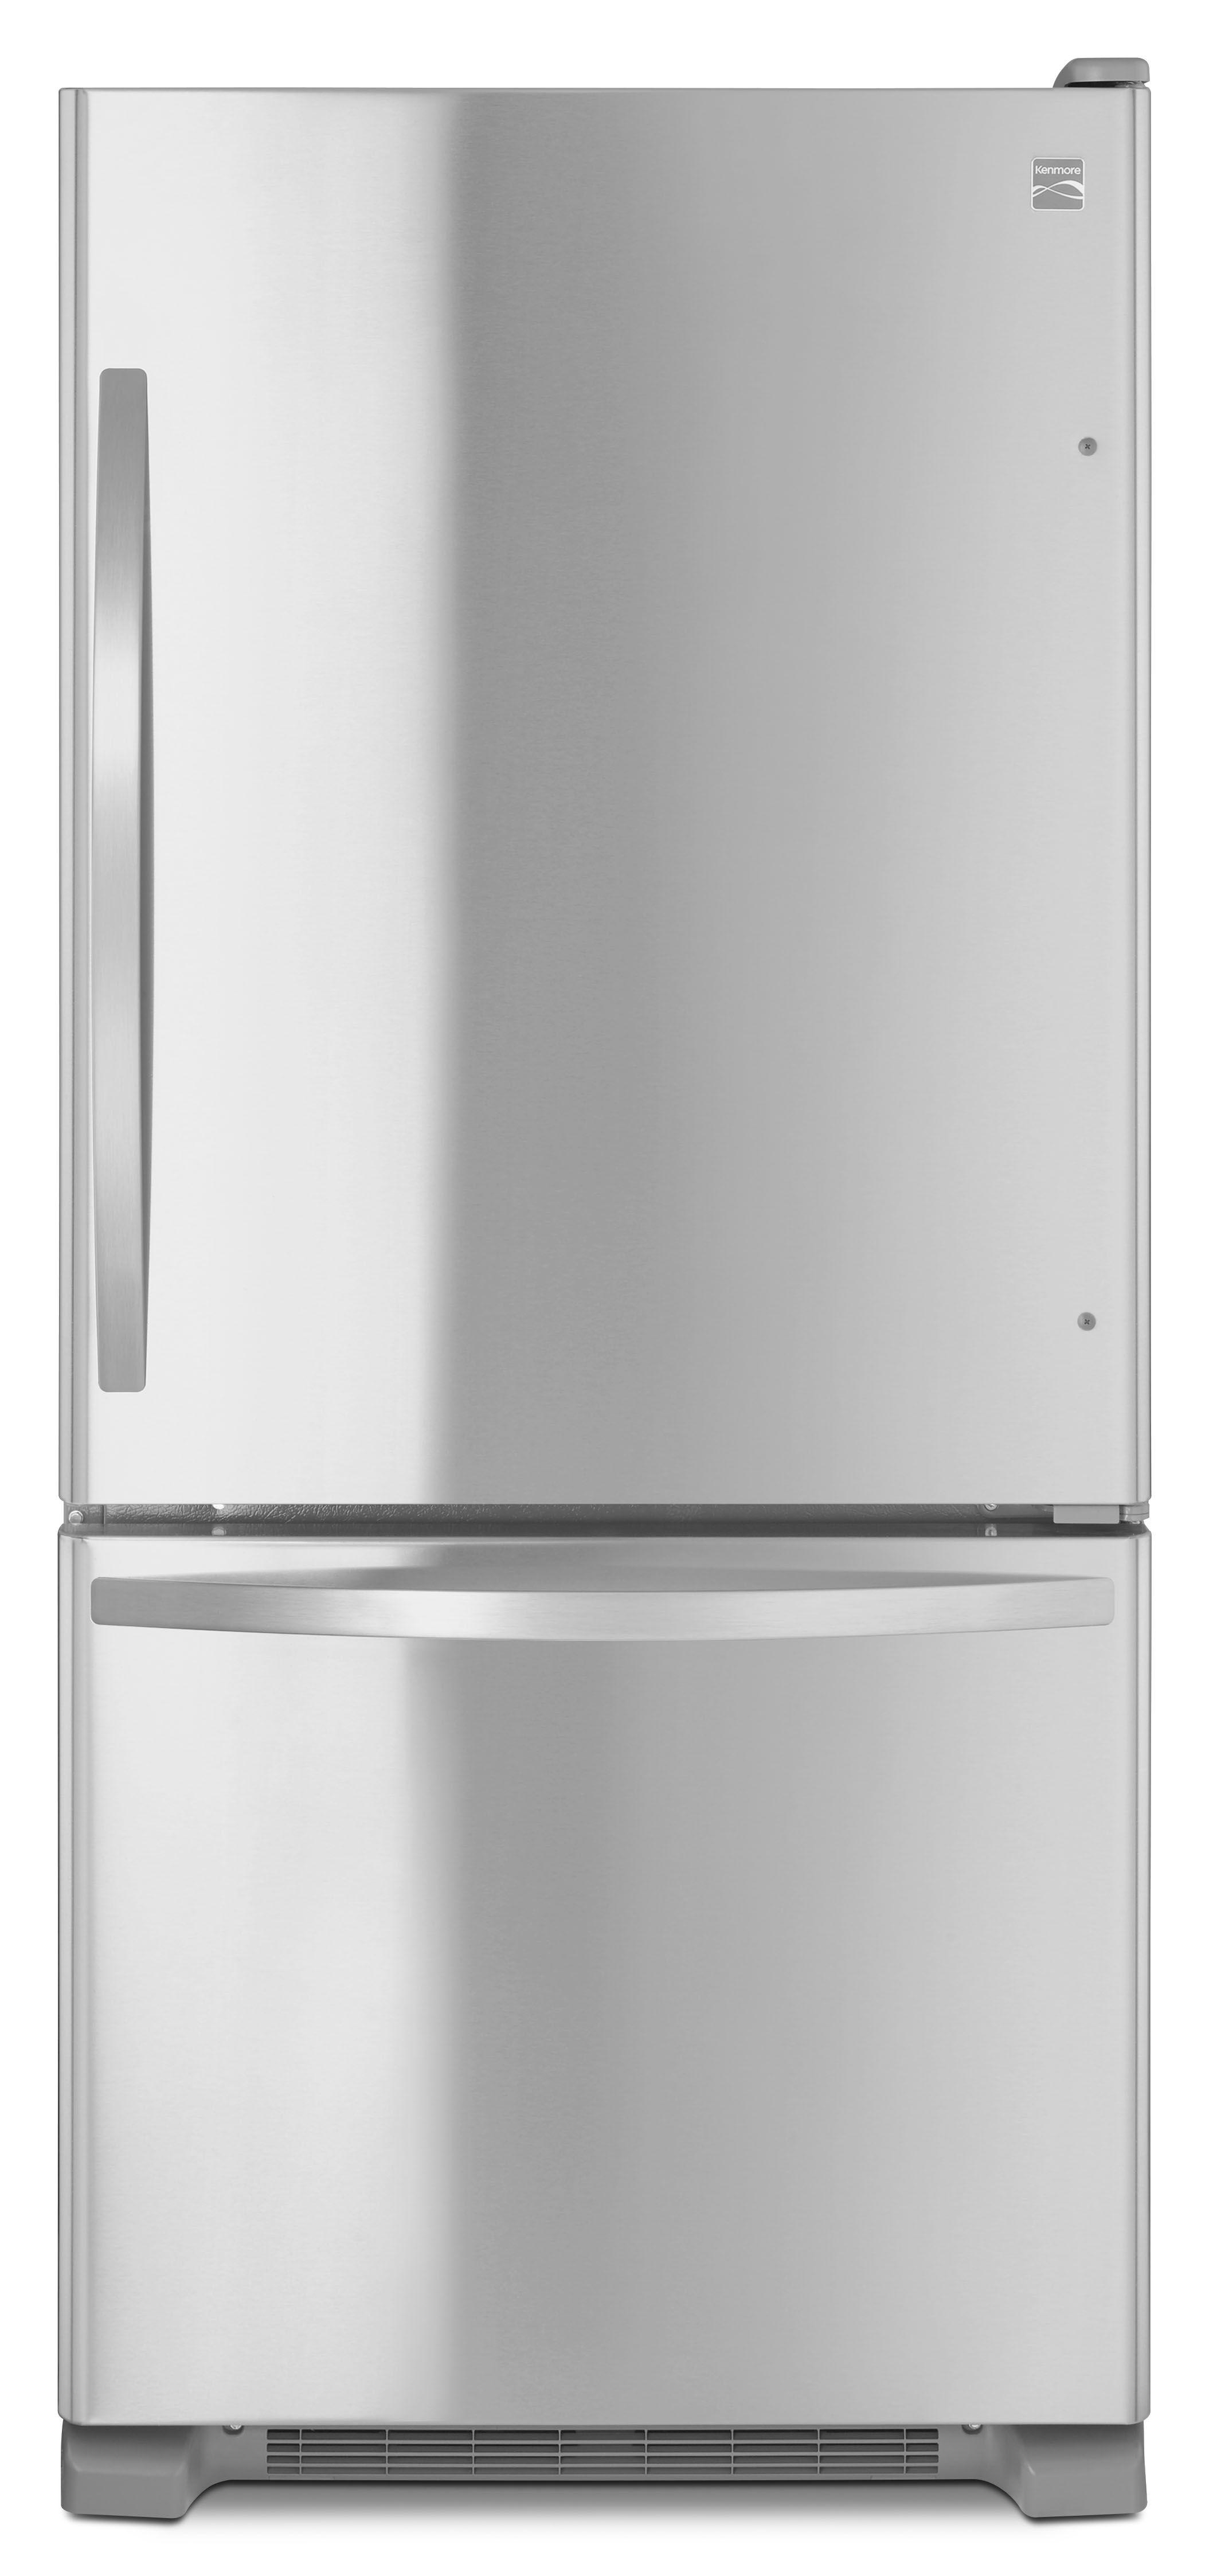 Check Out Kenmore 79313 19 Cu Ft Bottom Freezer Refrigerator Stainless Steel Shopyourway Bottom Freezer Bottom Freezer Refrigerator Refrigerator